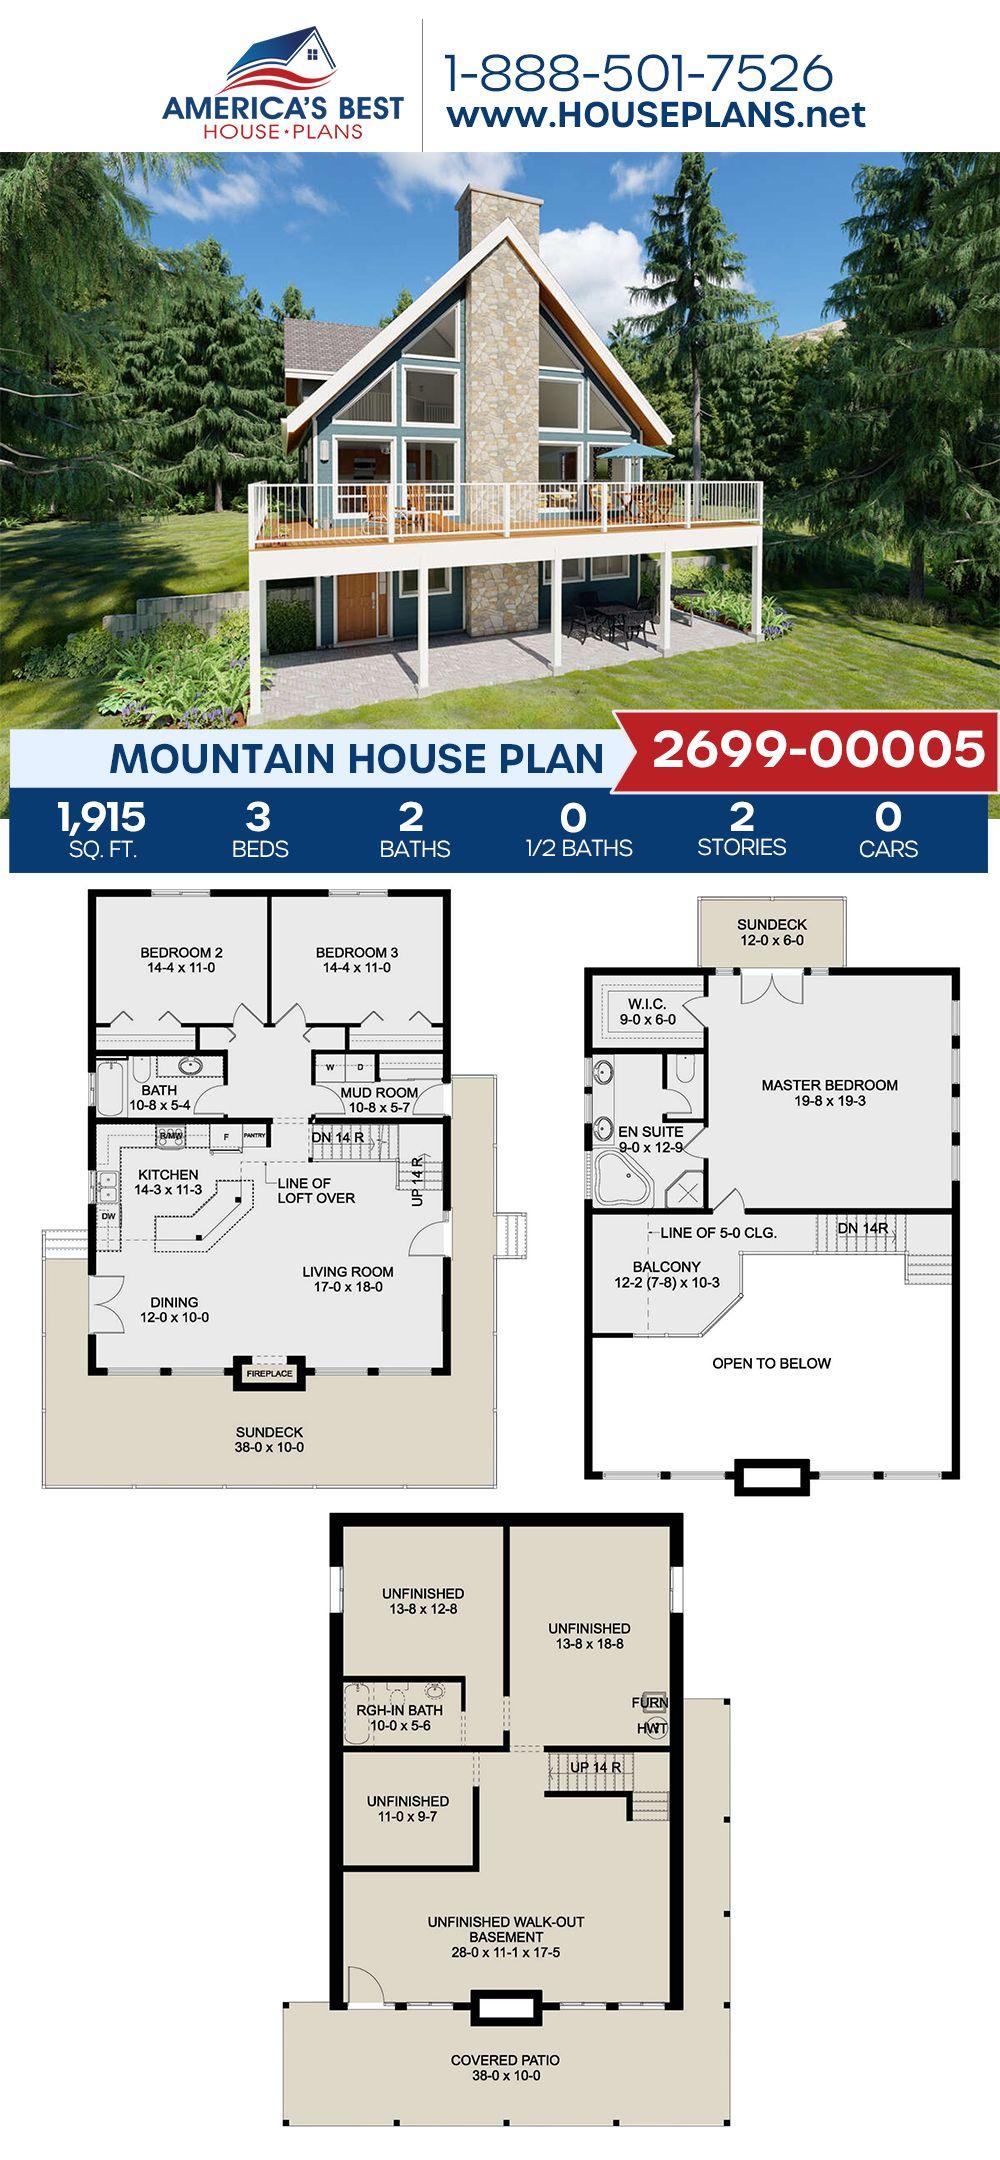 House Plan 2699 00005 Mountain Plan 1 915 Square Feet 3 Bedrooms 2 Bathrooms Lake House Plans Mountain House Plans Mudroom Floor Plan